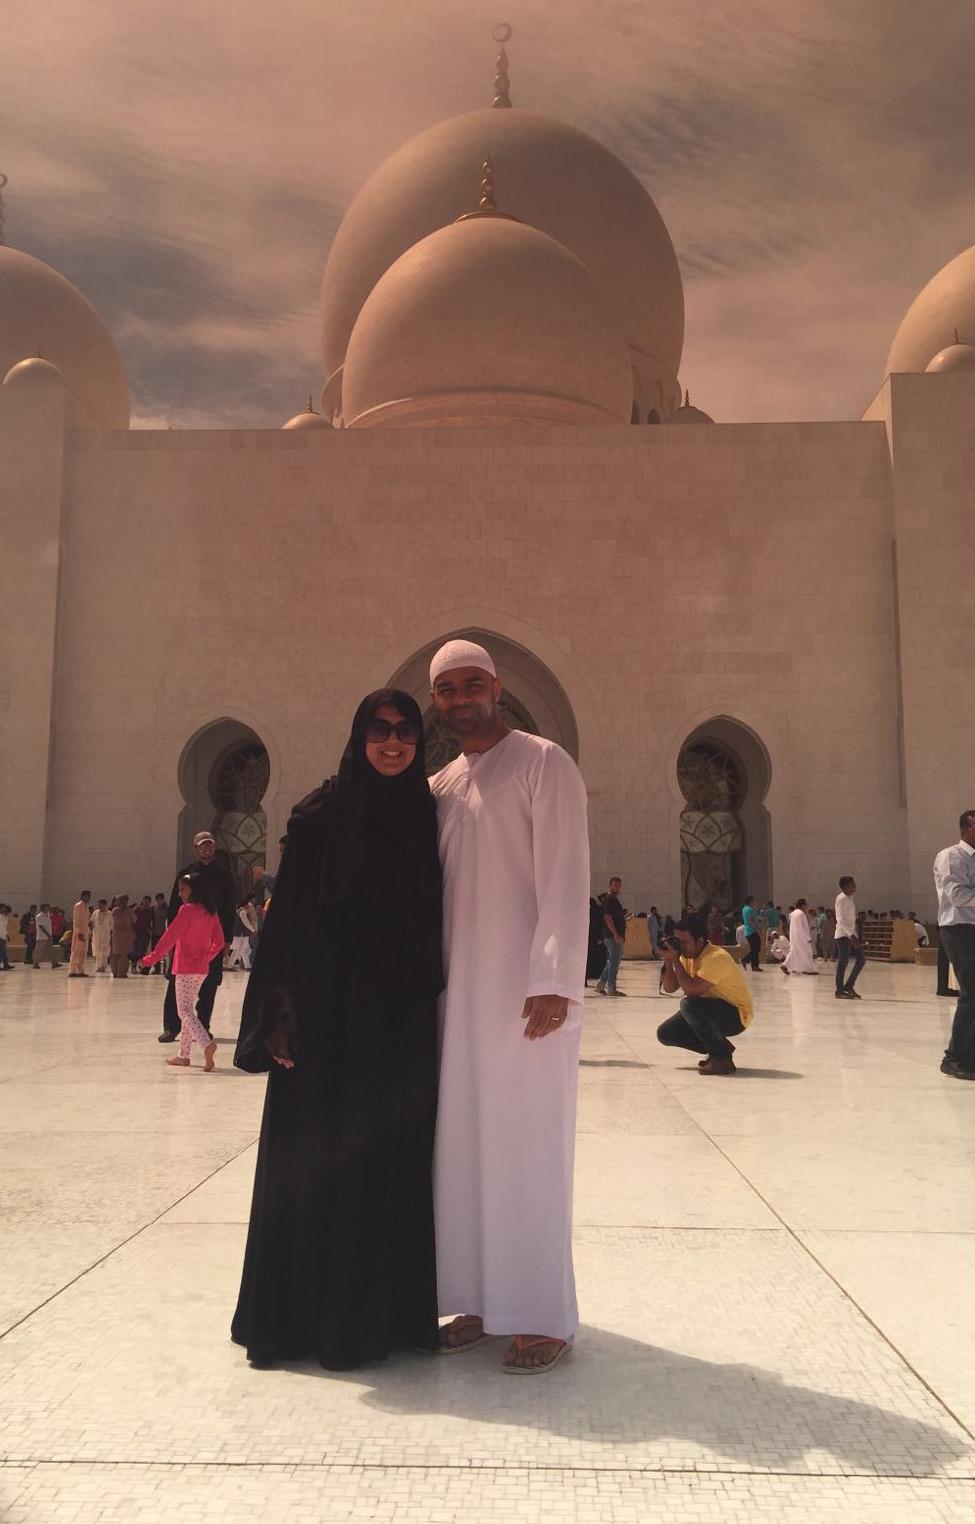 Sheikh-Zayed-Grand-Mosque-Abu-Dhabi-43